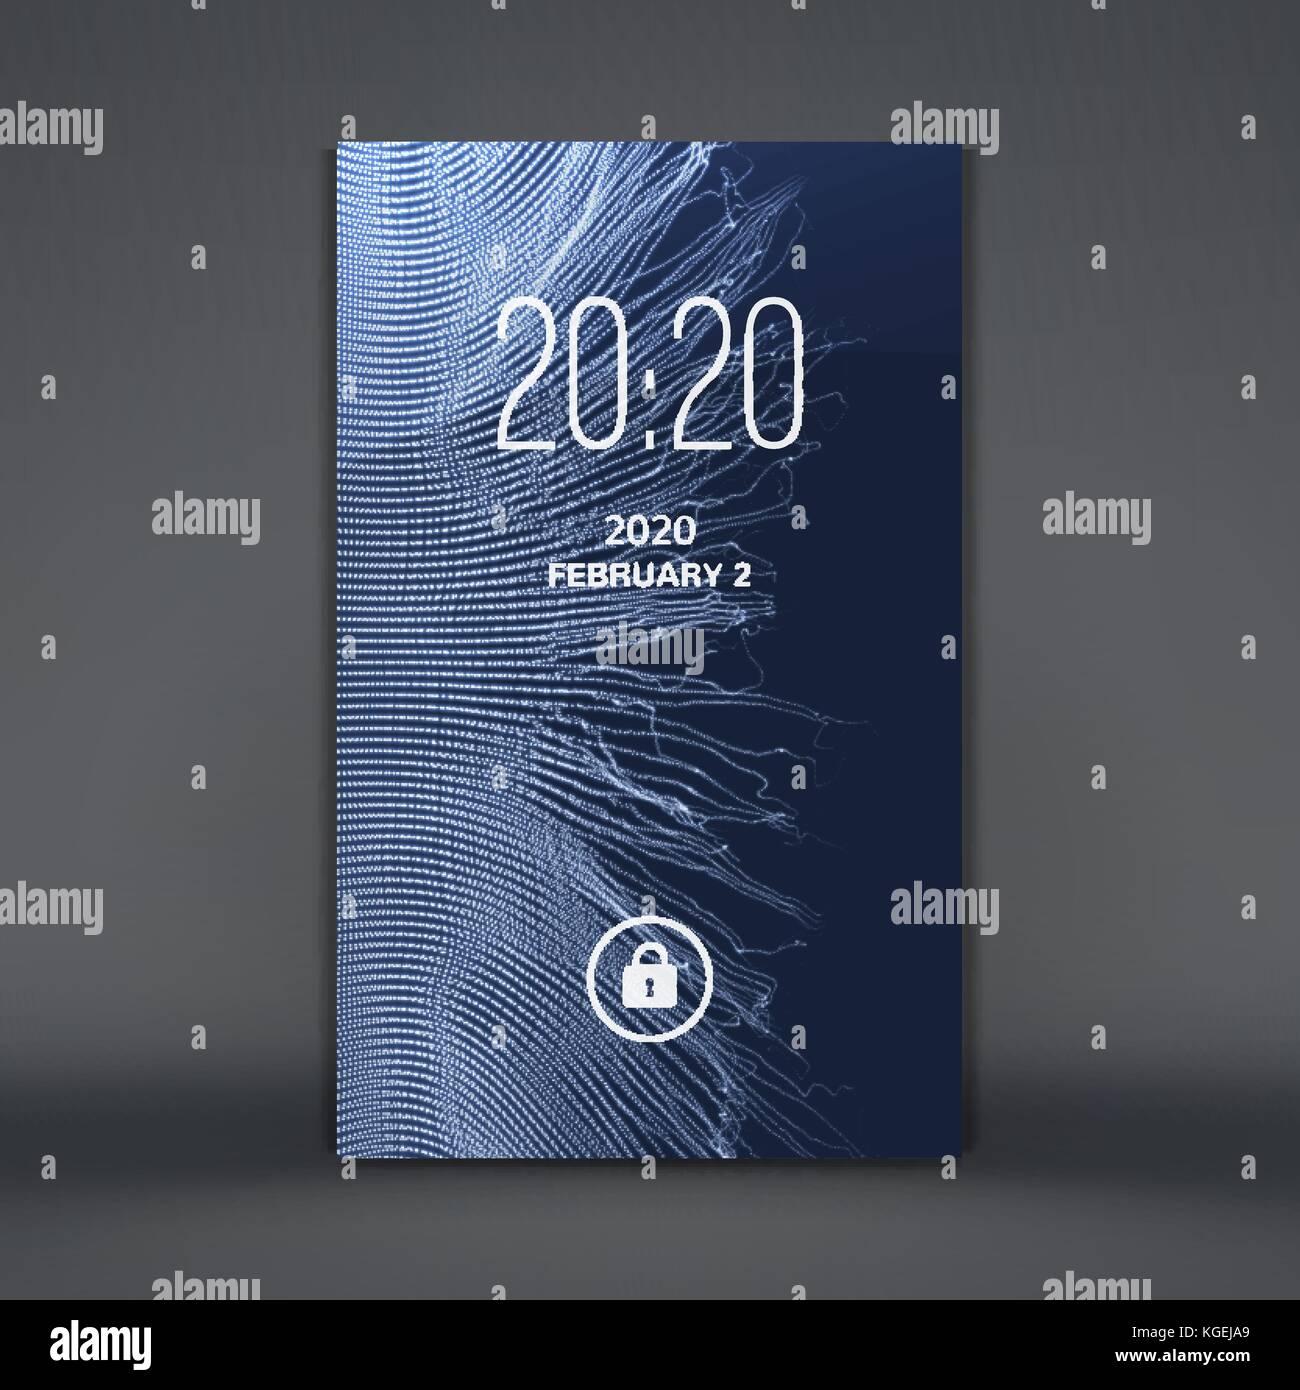 lock screen background.html